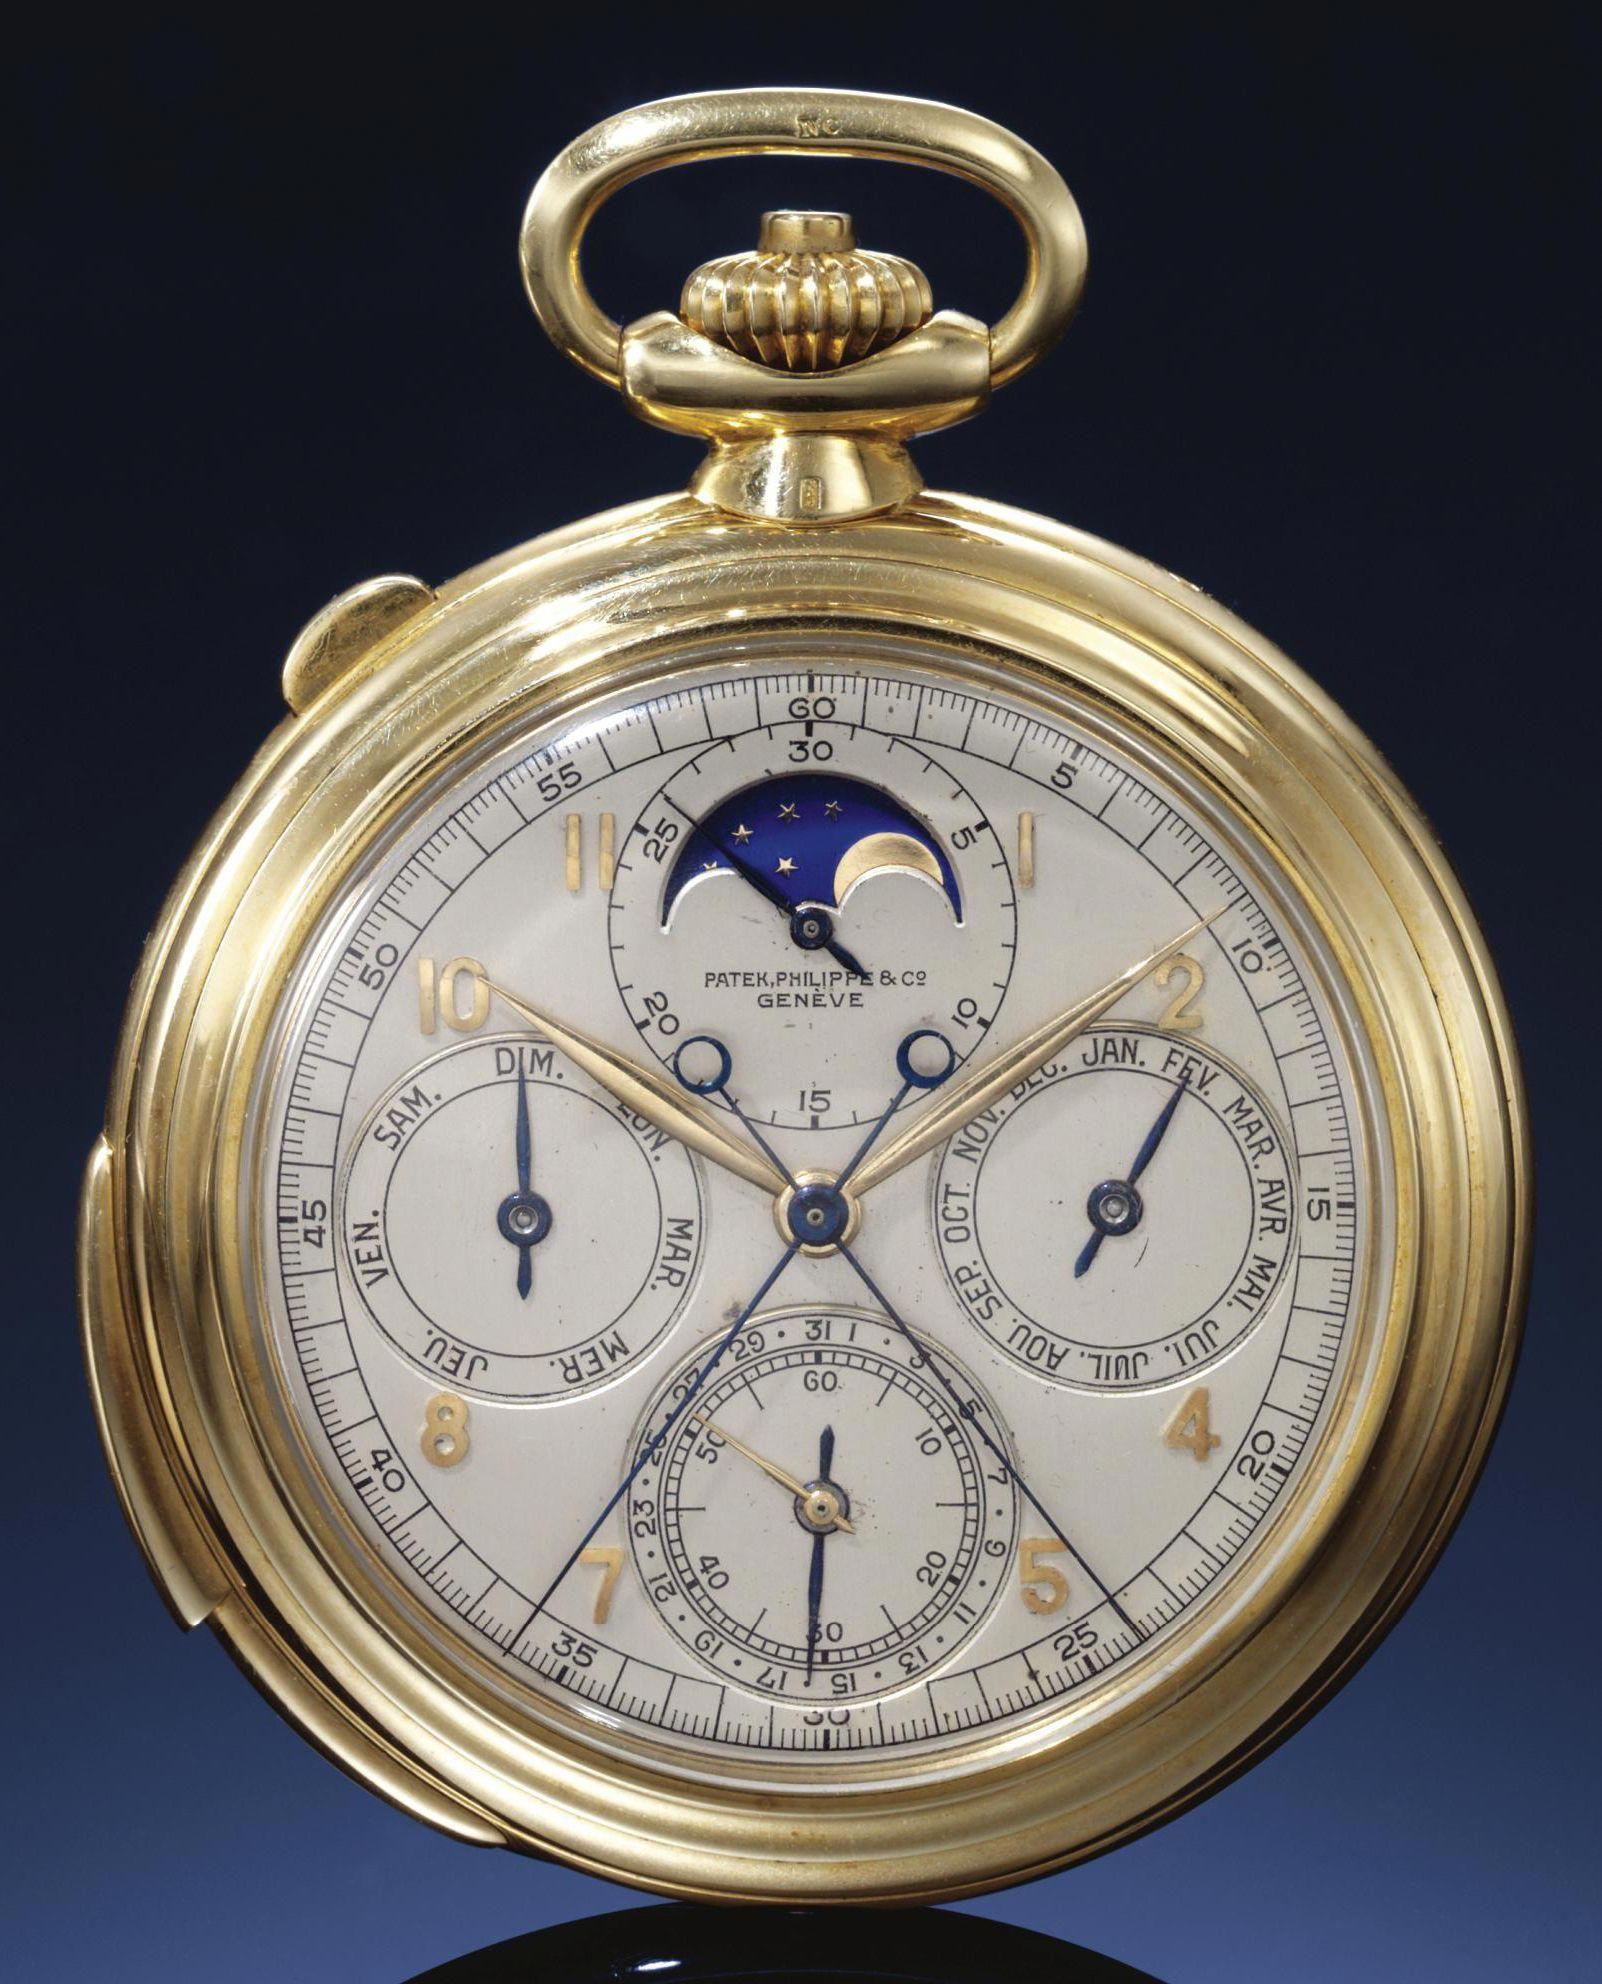 6c9b7b814 MEYER & STUDELI TIEGA ART DECO RUNNING 44mm VINTAGE POCKET WATCH   eBay    Watches   Vintage pocket watch, Watches, Pocket watch